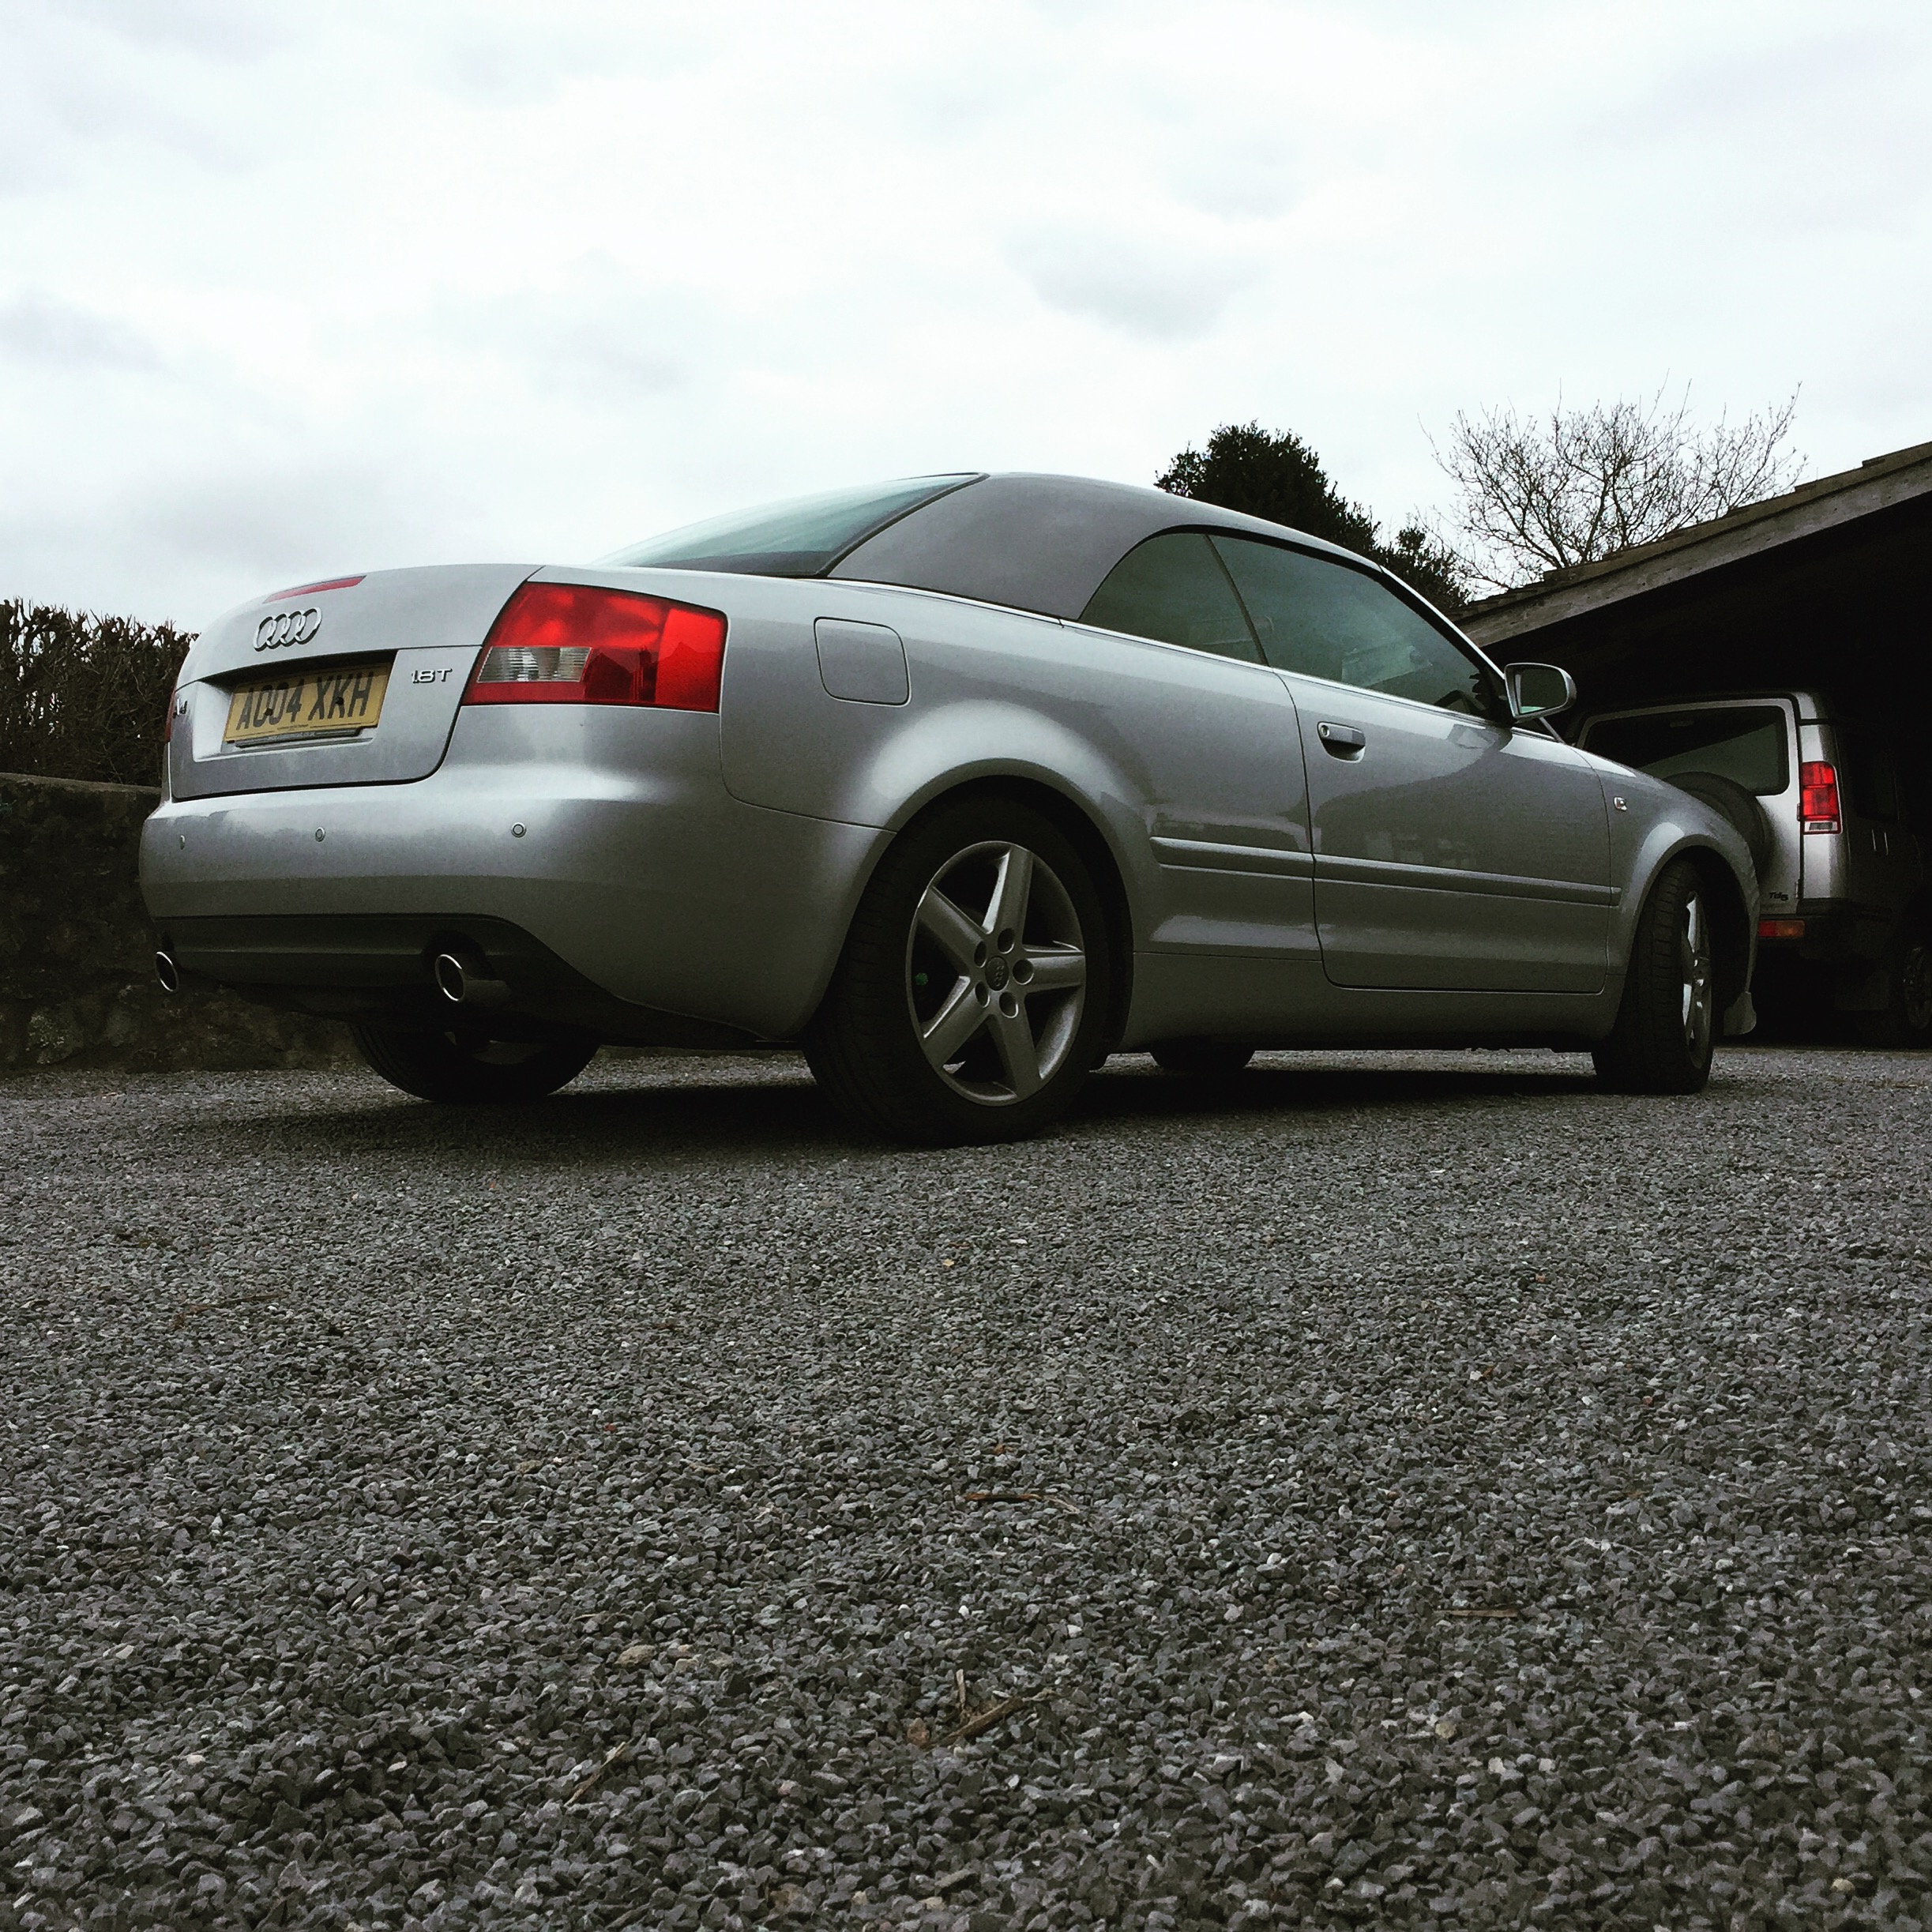 Audi B6 B7 Cabriolet Wiesmann Hardtop (ultra Rare Part